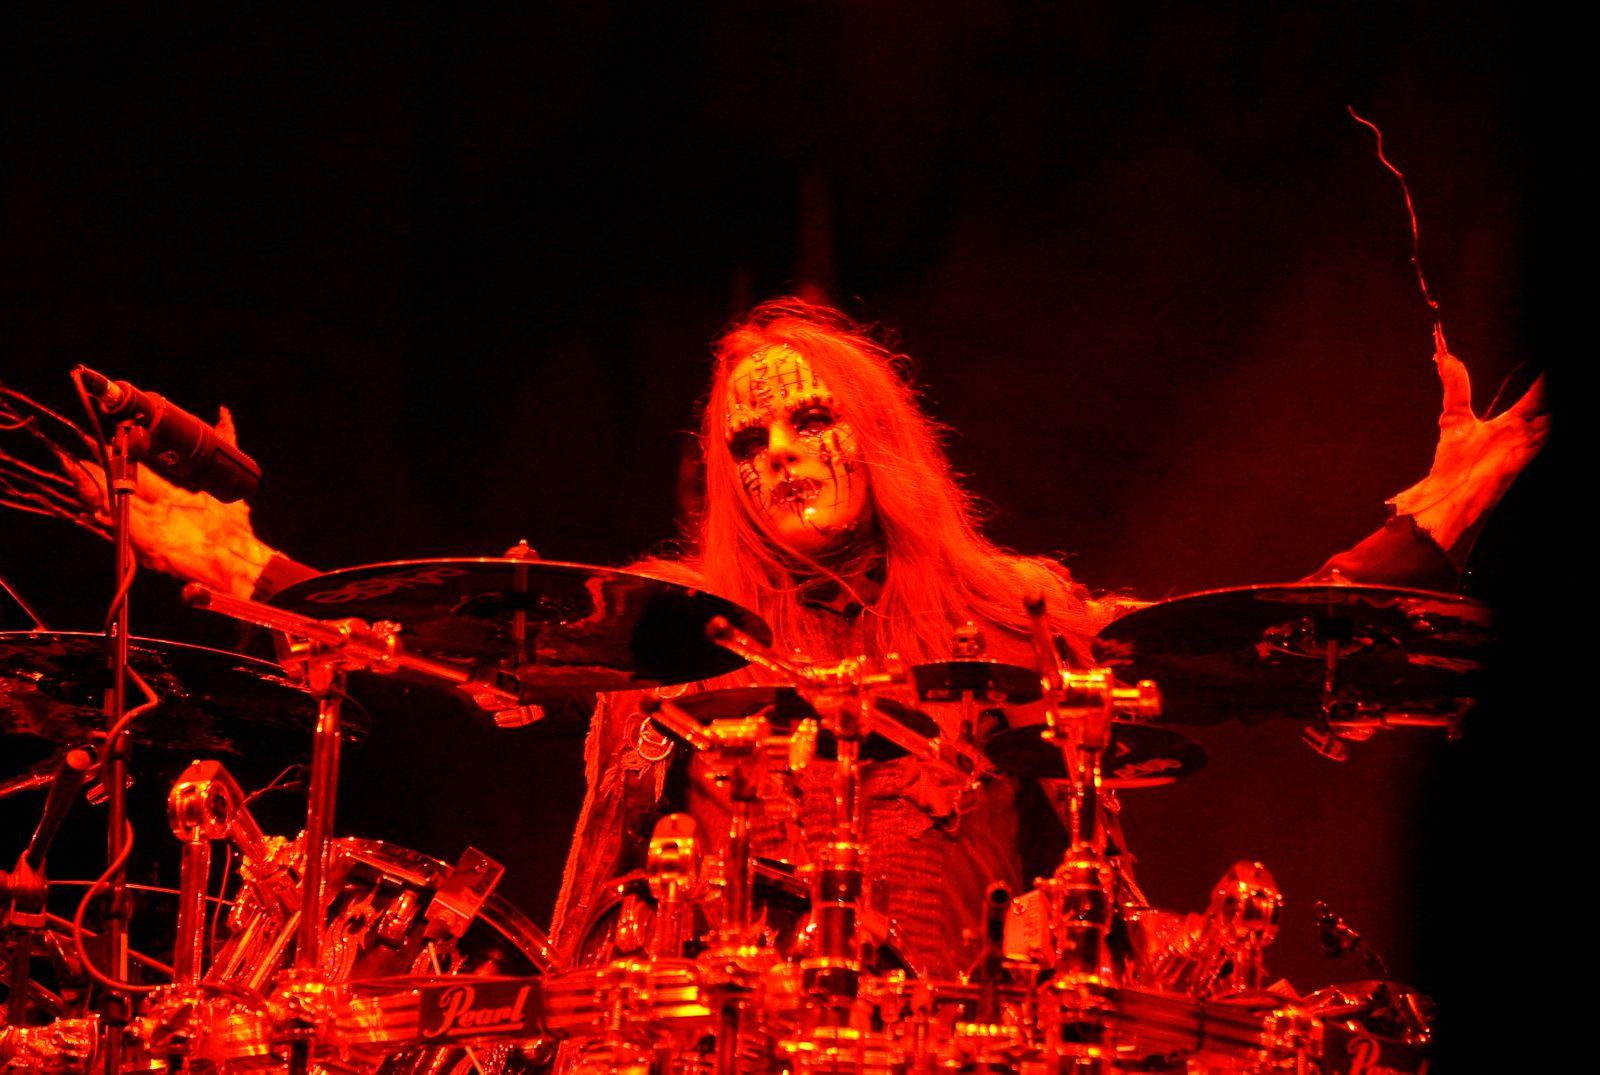 Slipknot co-founder Joey Jordison dies at age 46